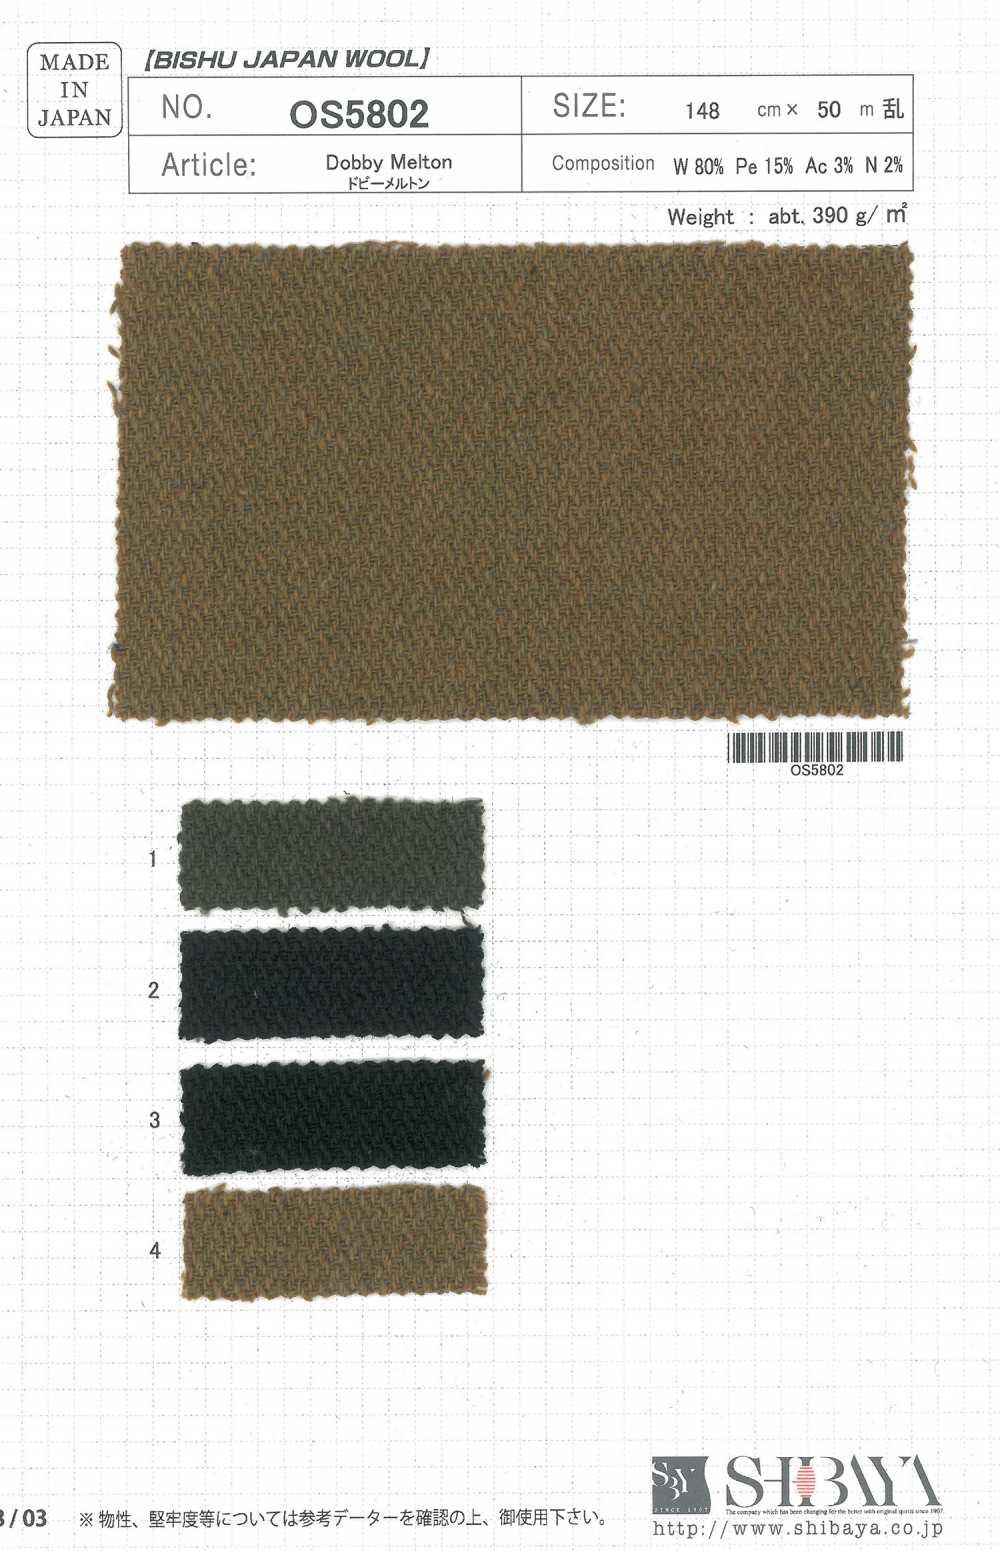 OS5802 ドビーメルトン[生地] 柴屋/オークラ商事 - ApparelX アパレル資材卸通販